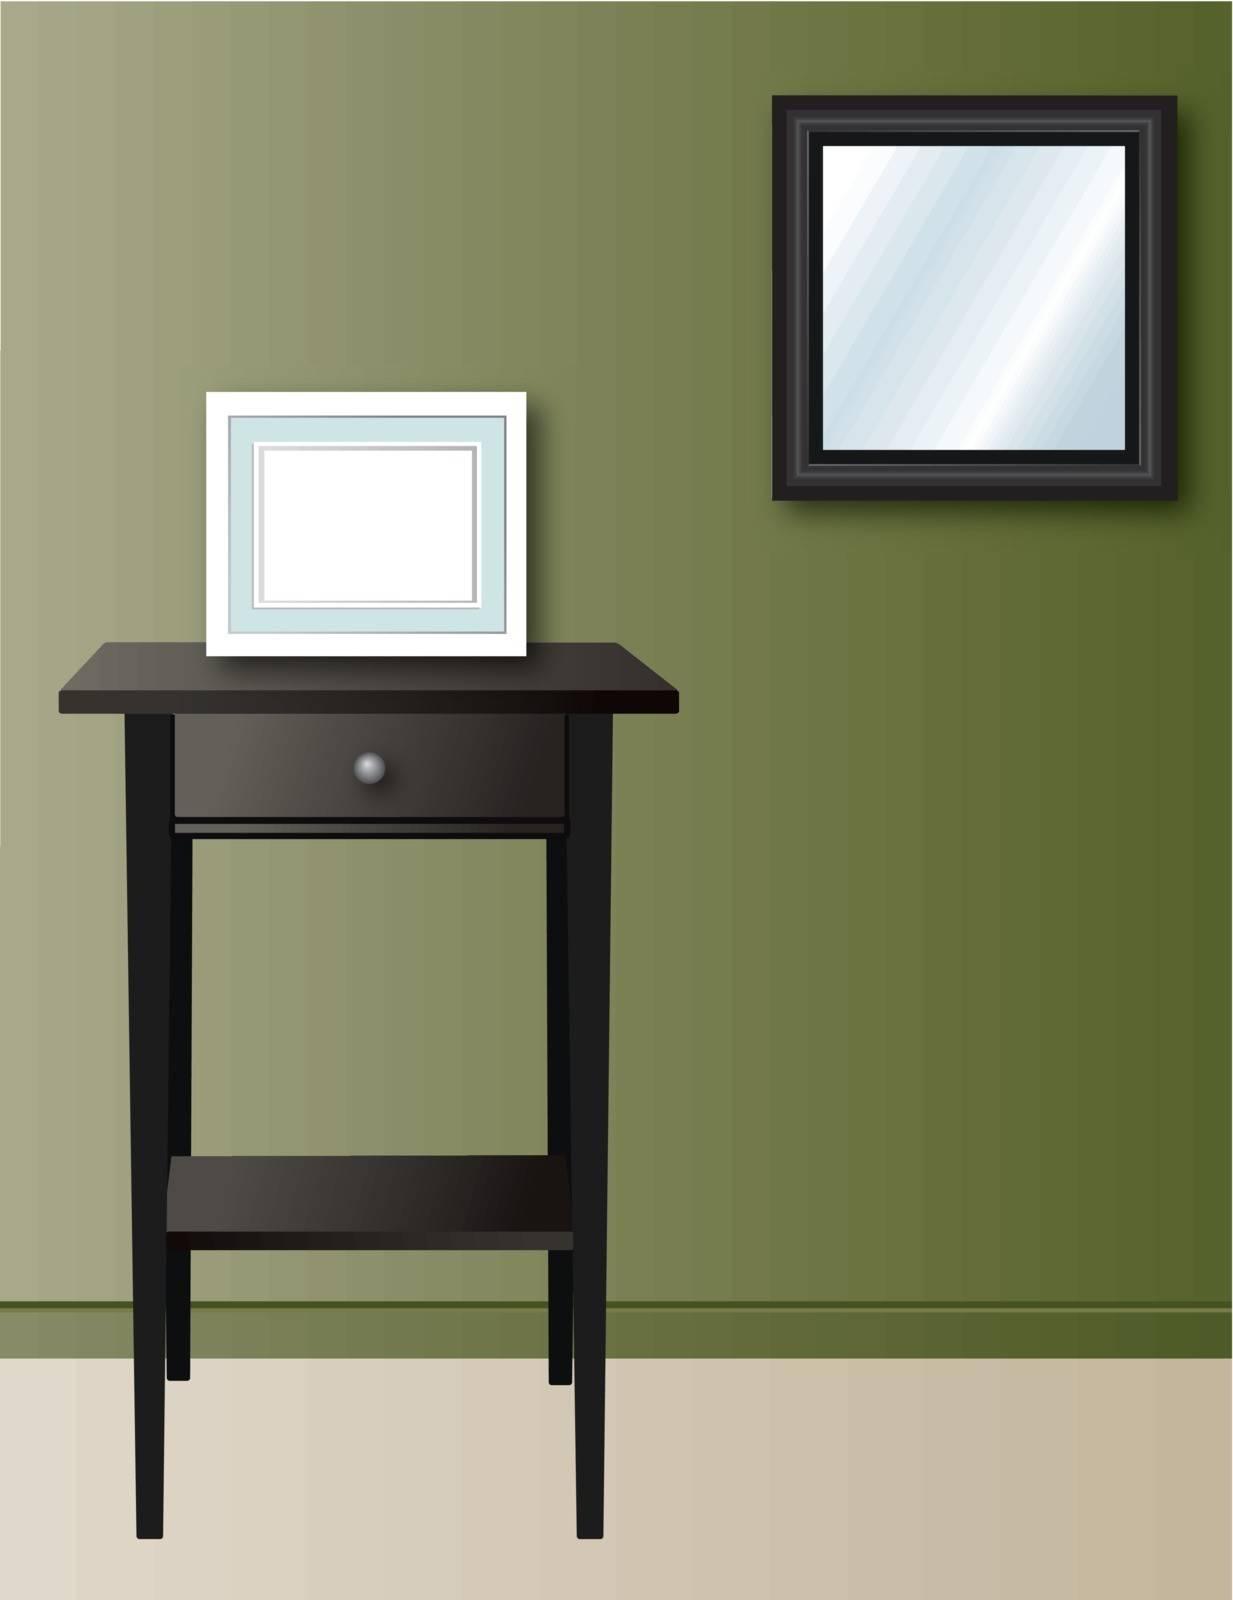 home wall decor illustration